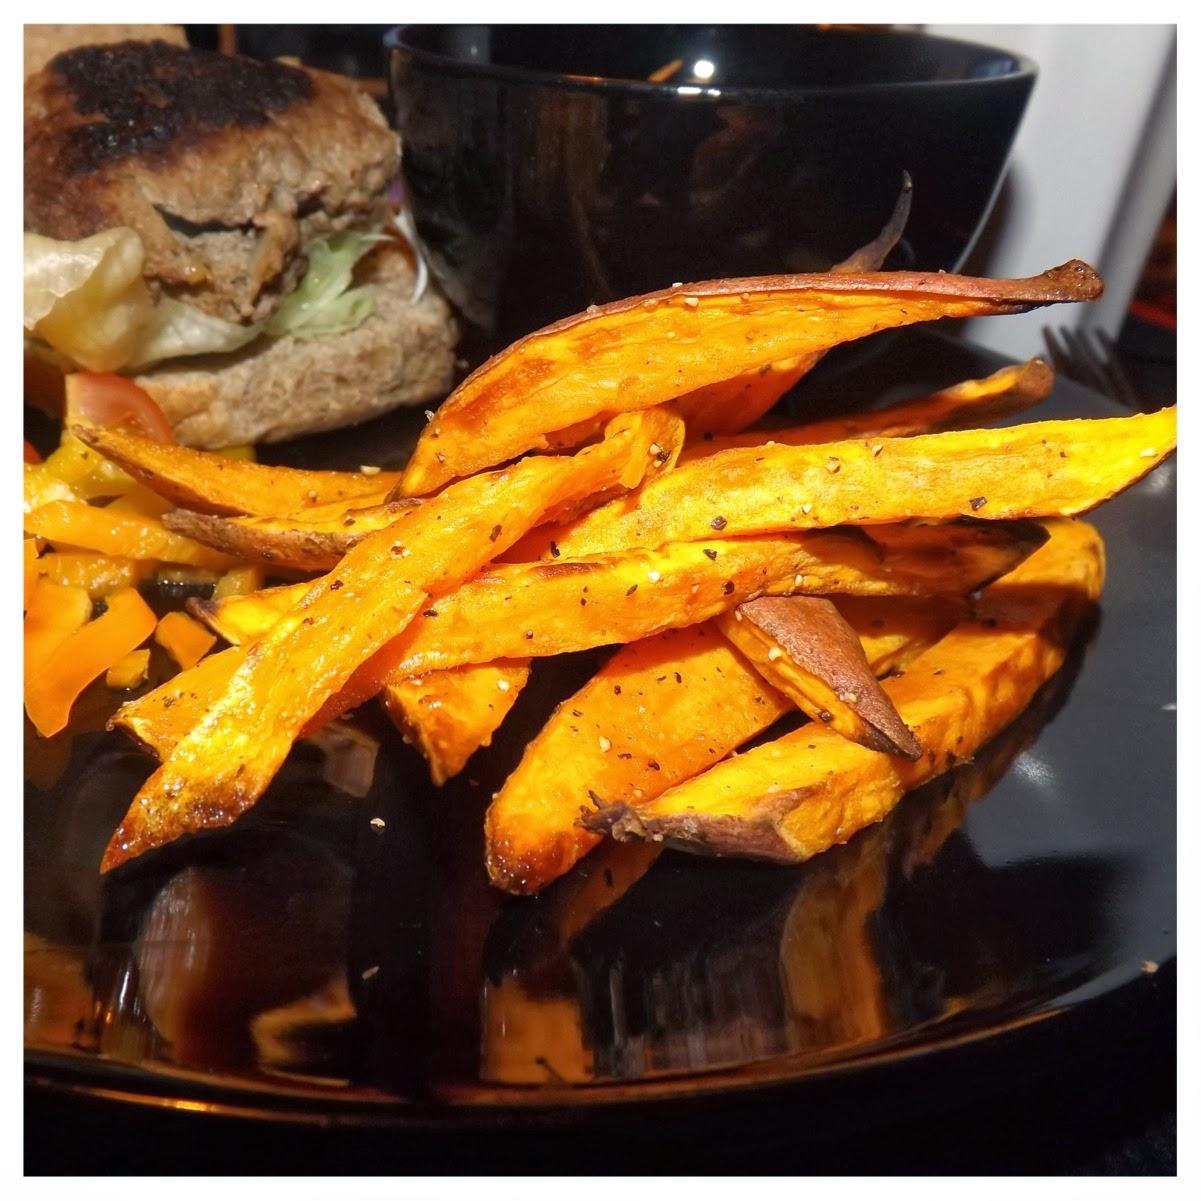 Slimming World sweet potato fries